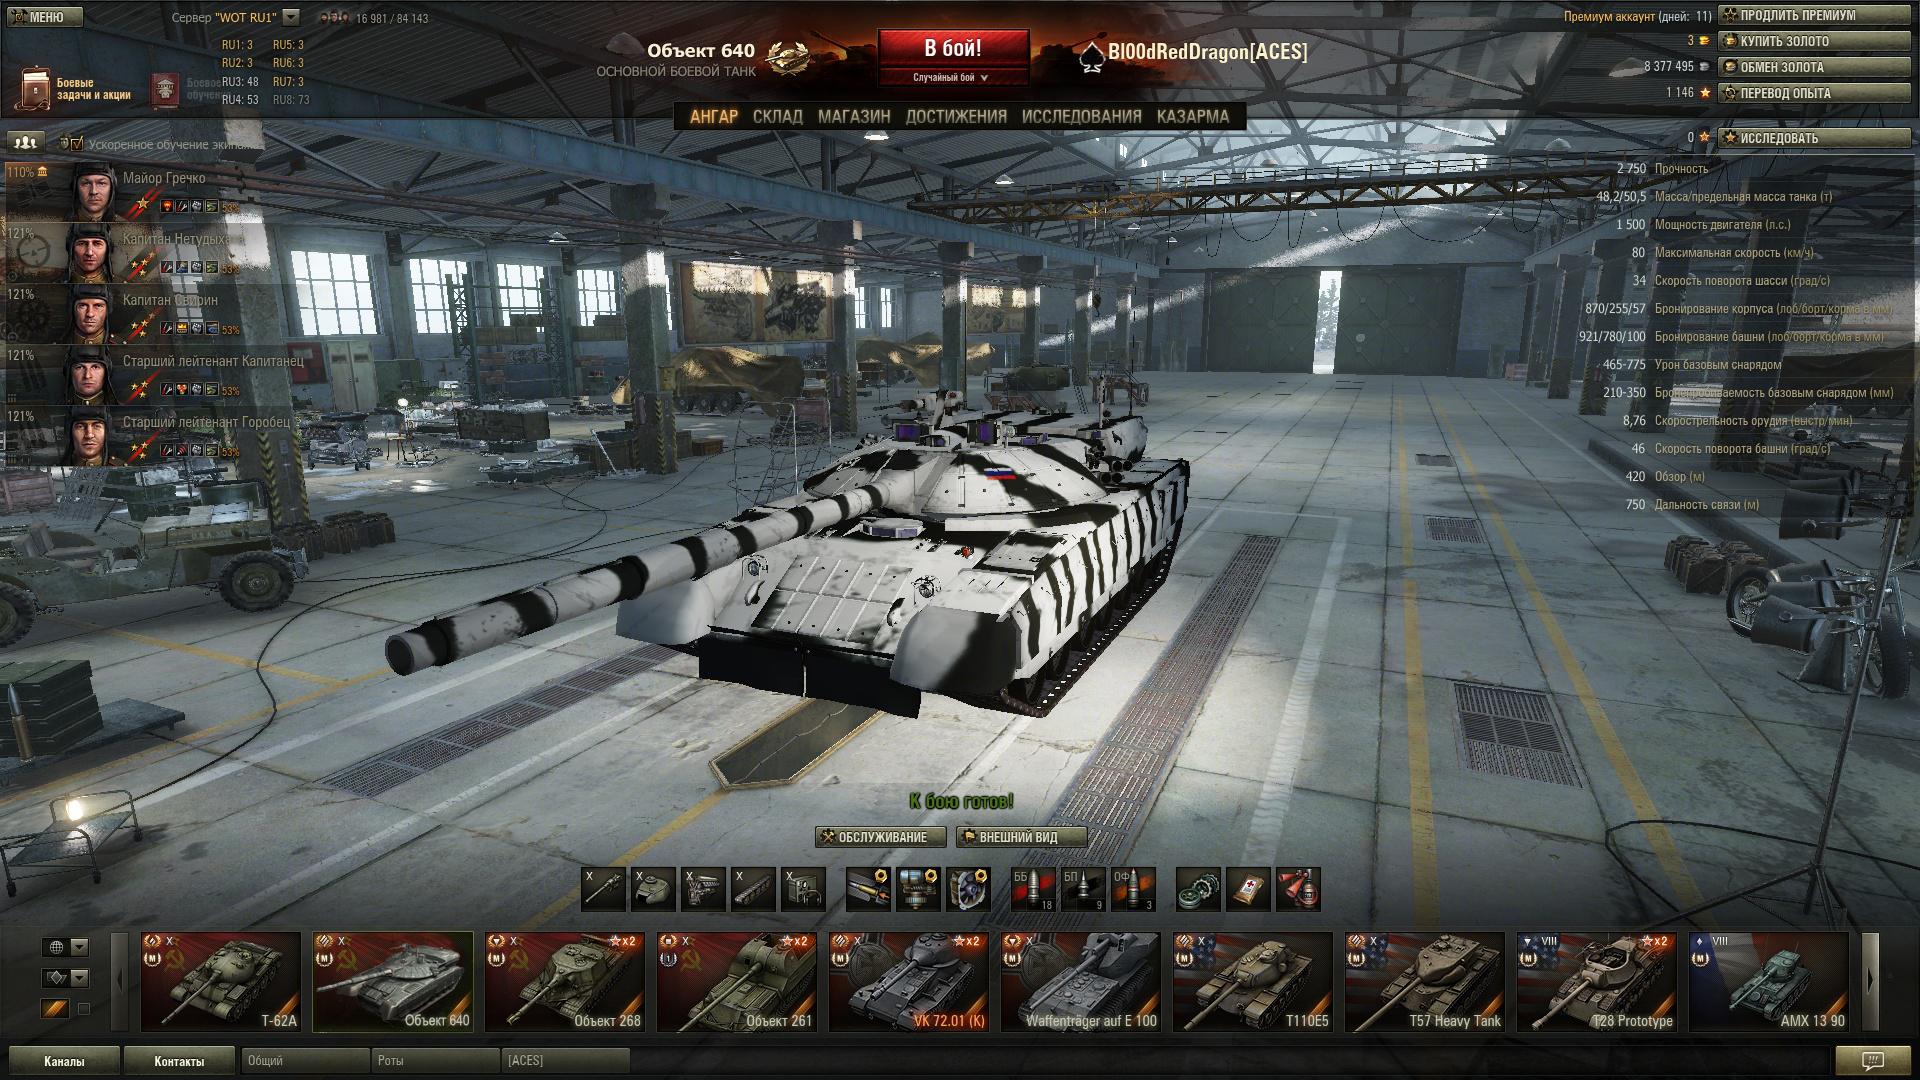 Аккаунты на world of tanks с танками 10 уровня